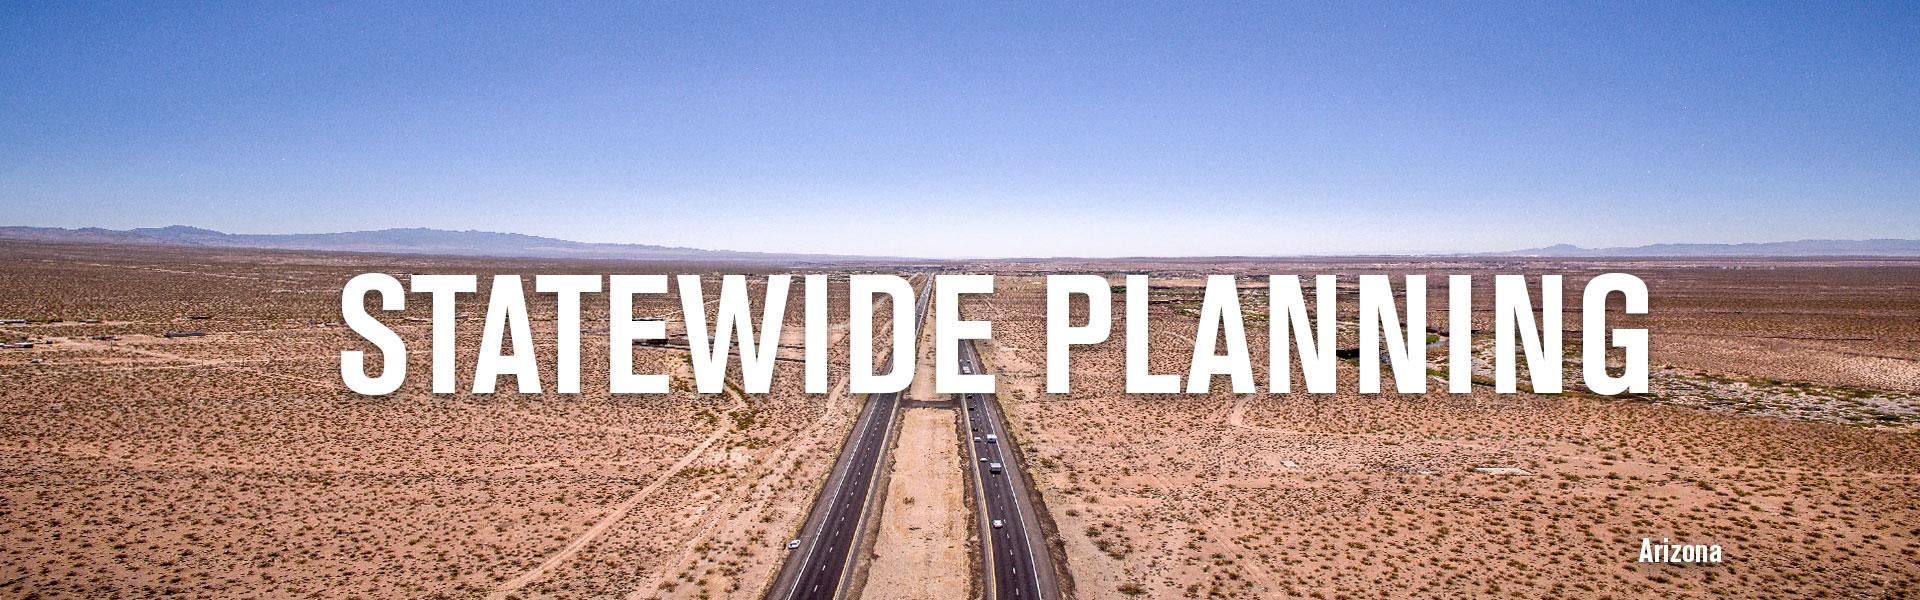 Statewide Planning